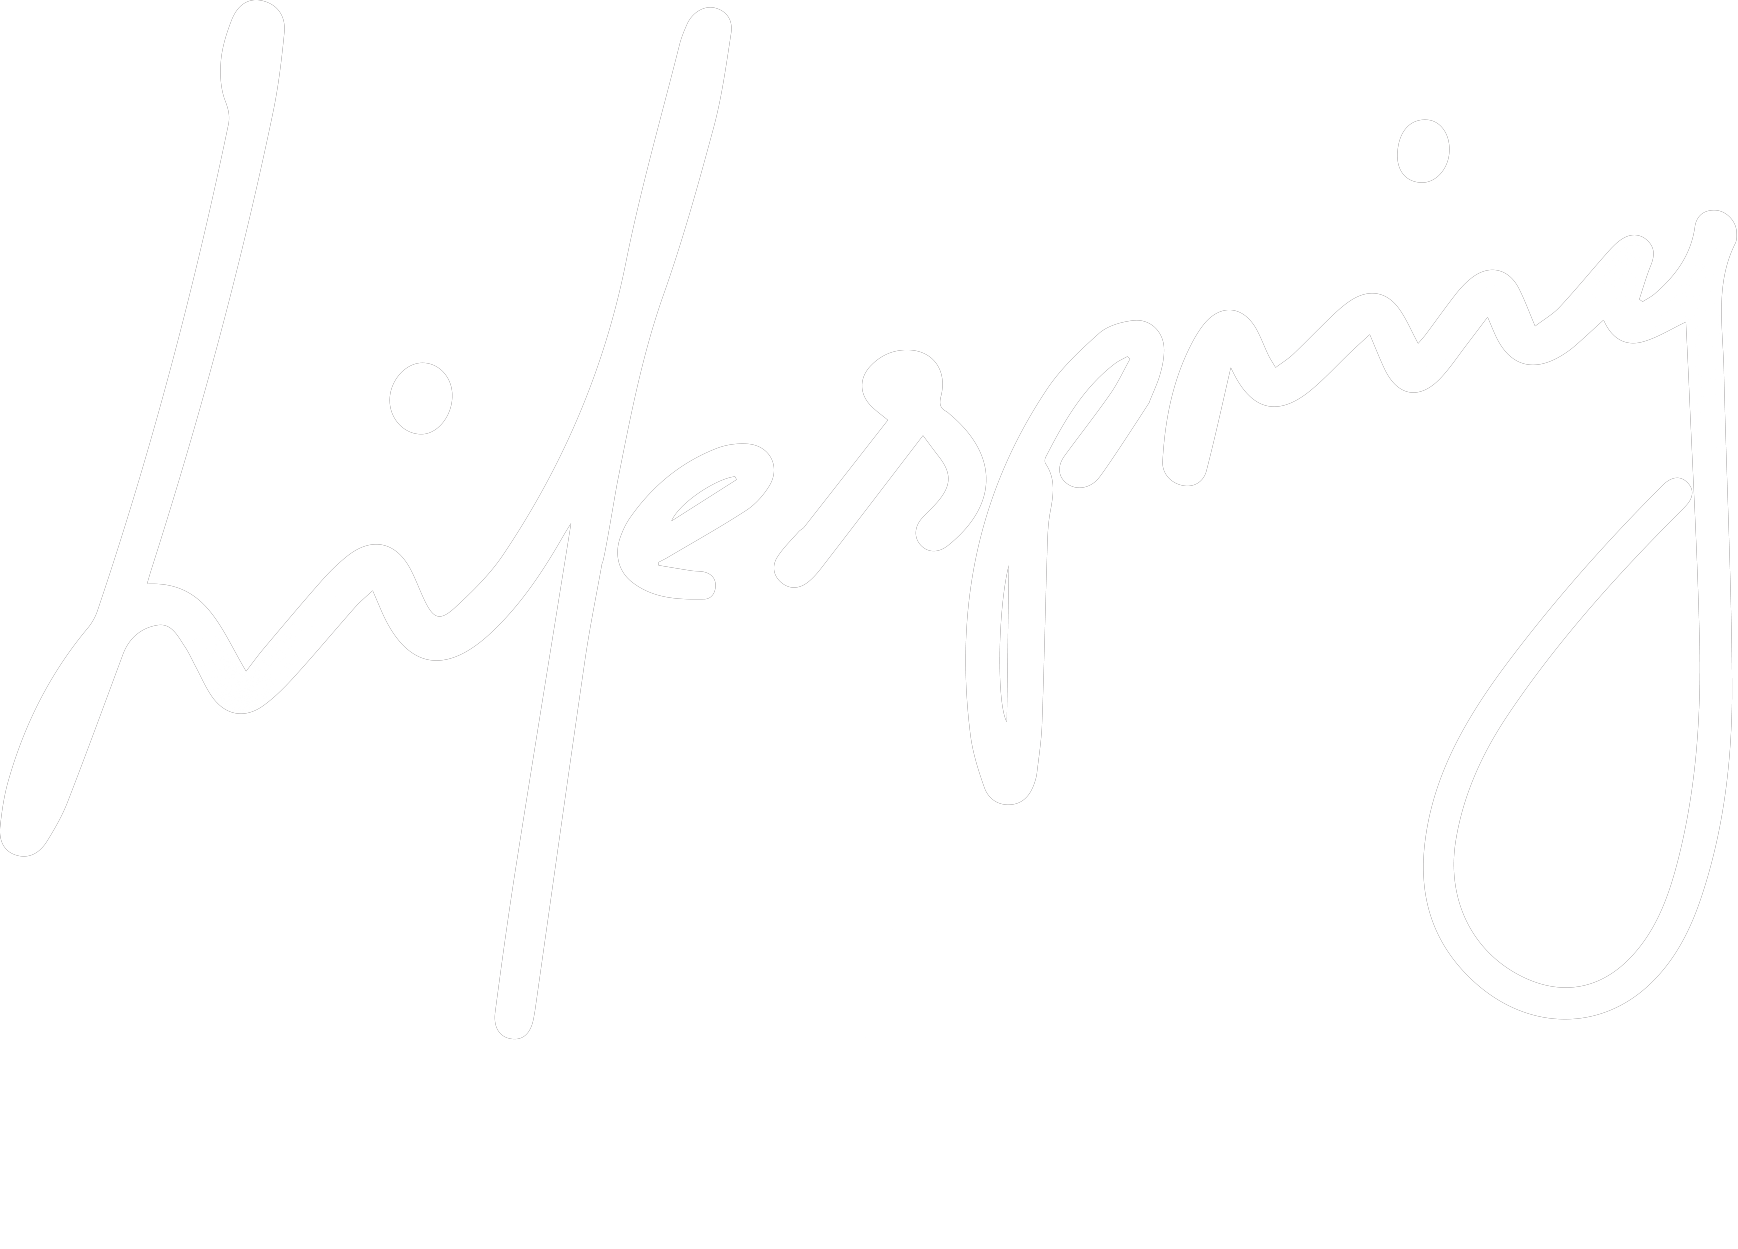 Lifespring Church Echuca